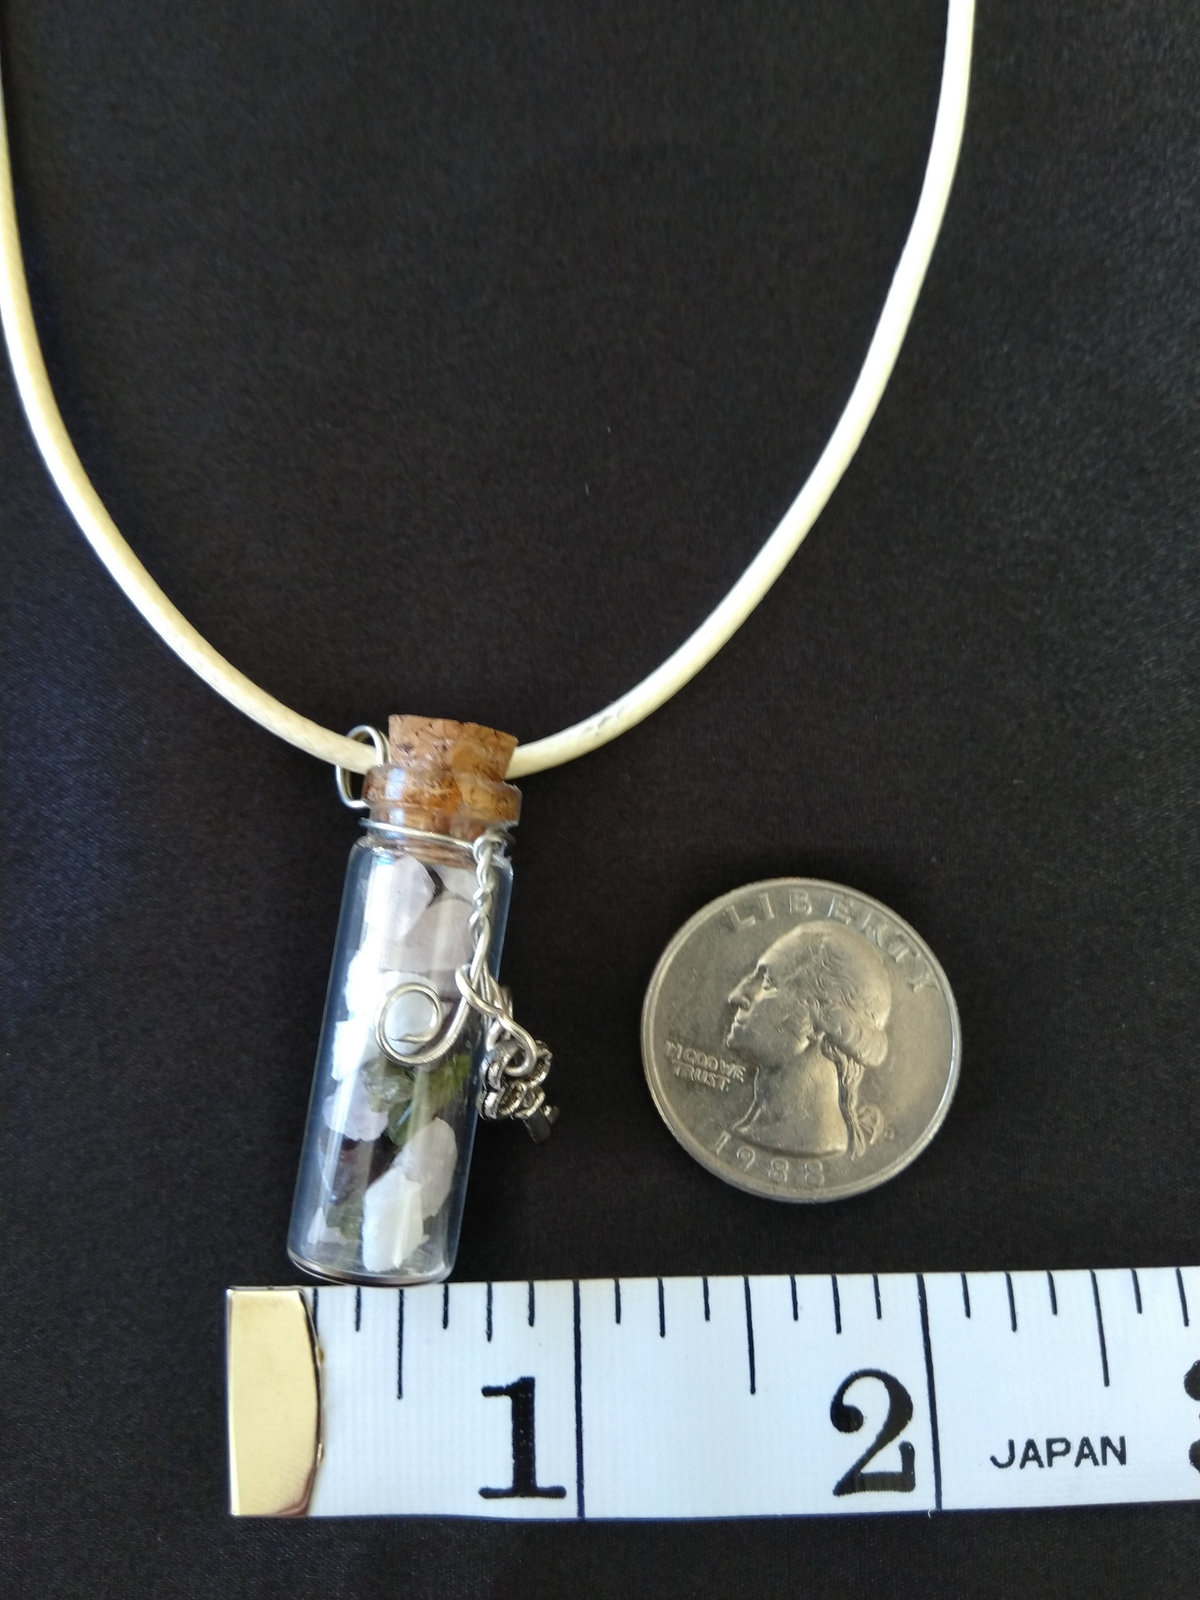 Healing Labradorite Potion Bottle Pendant with Garnet, Peridot, Pink Quartz, and